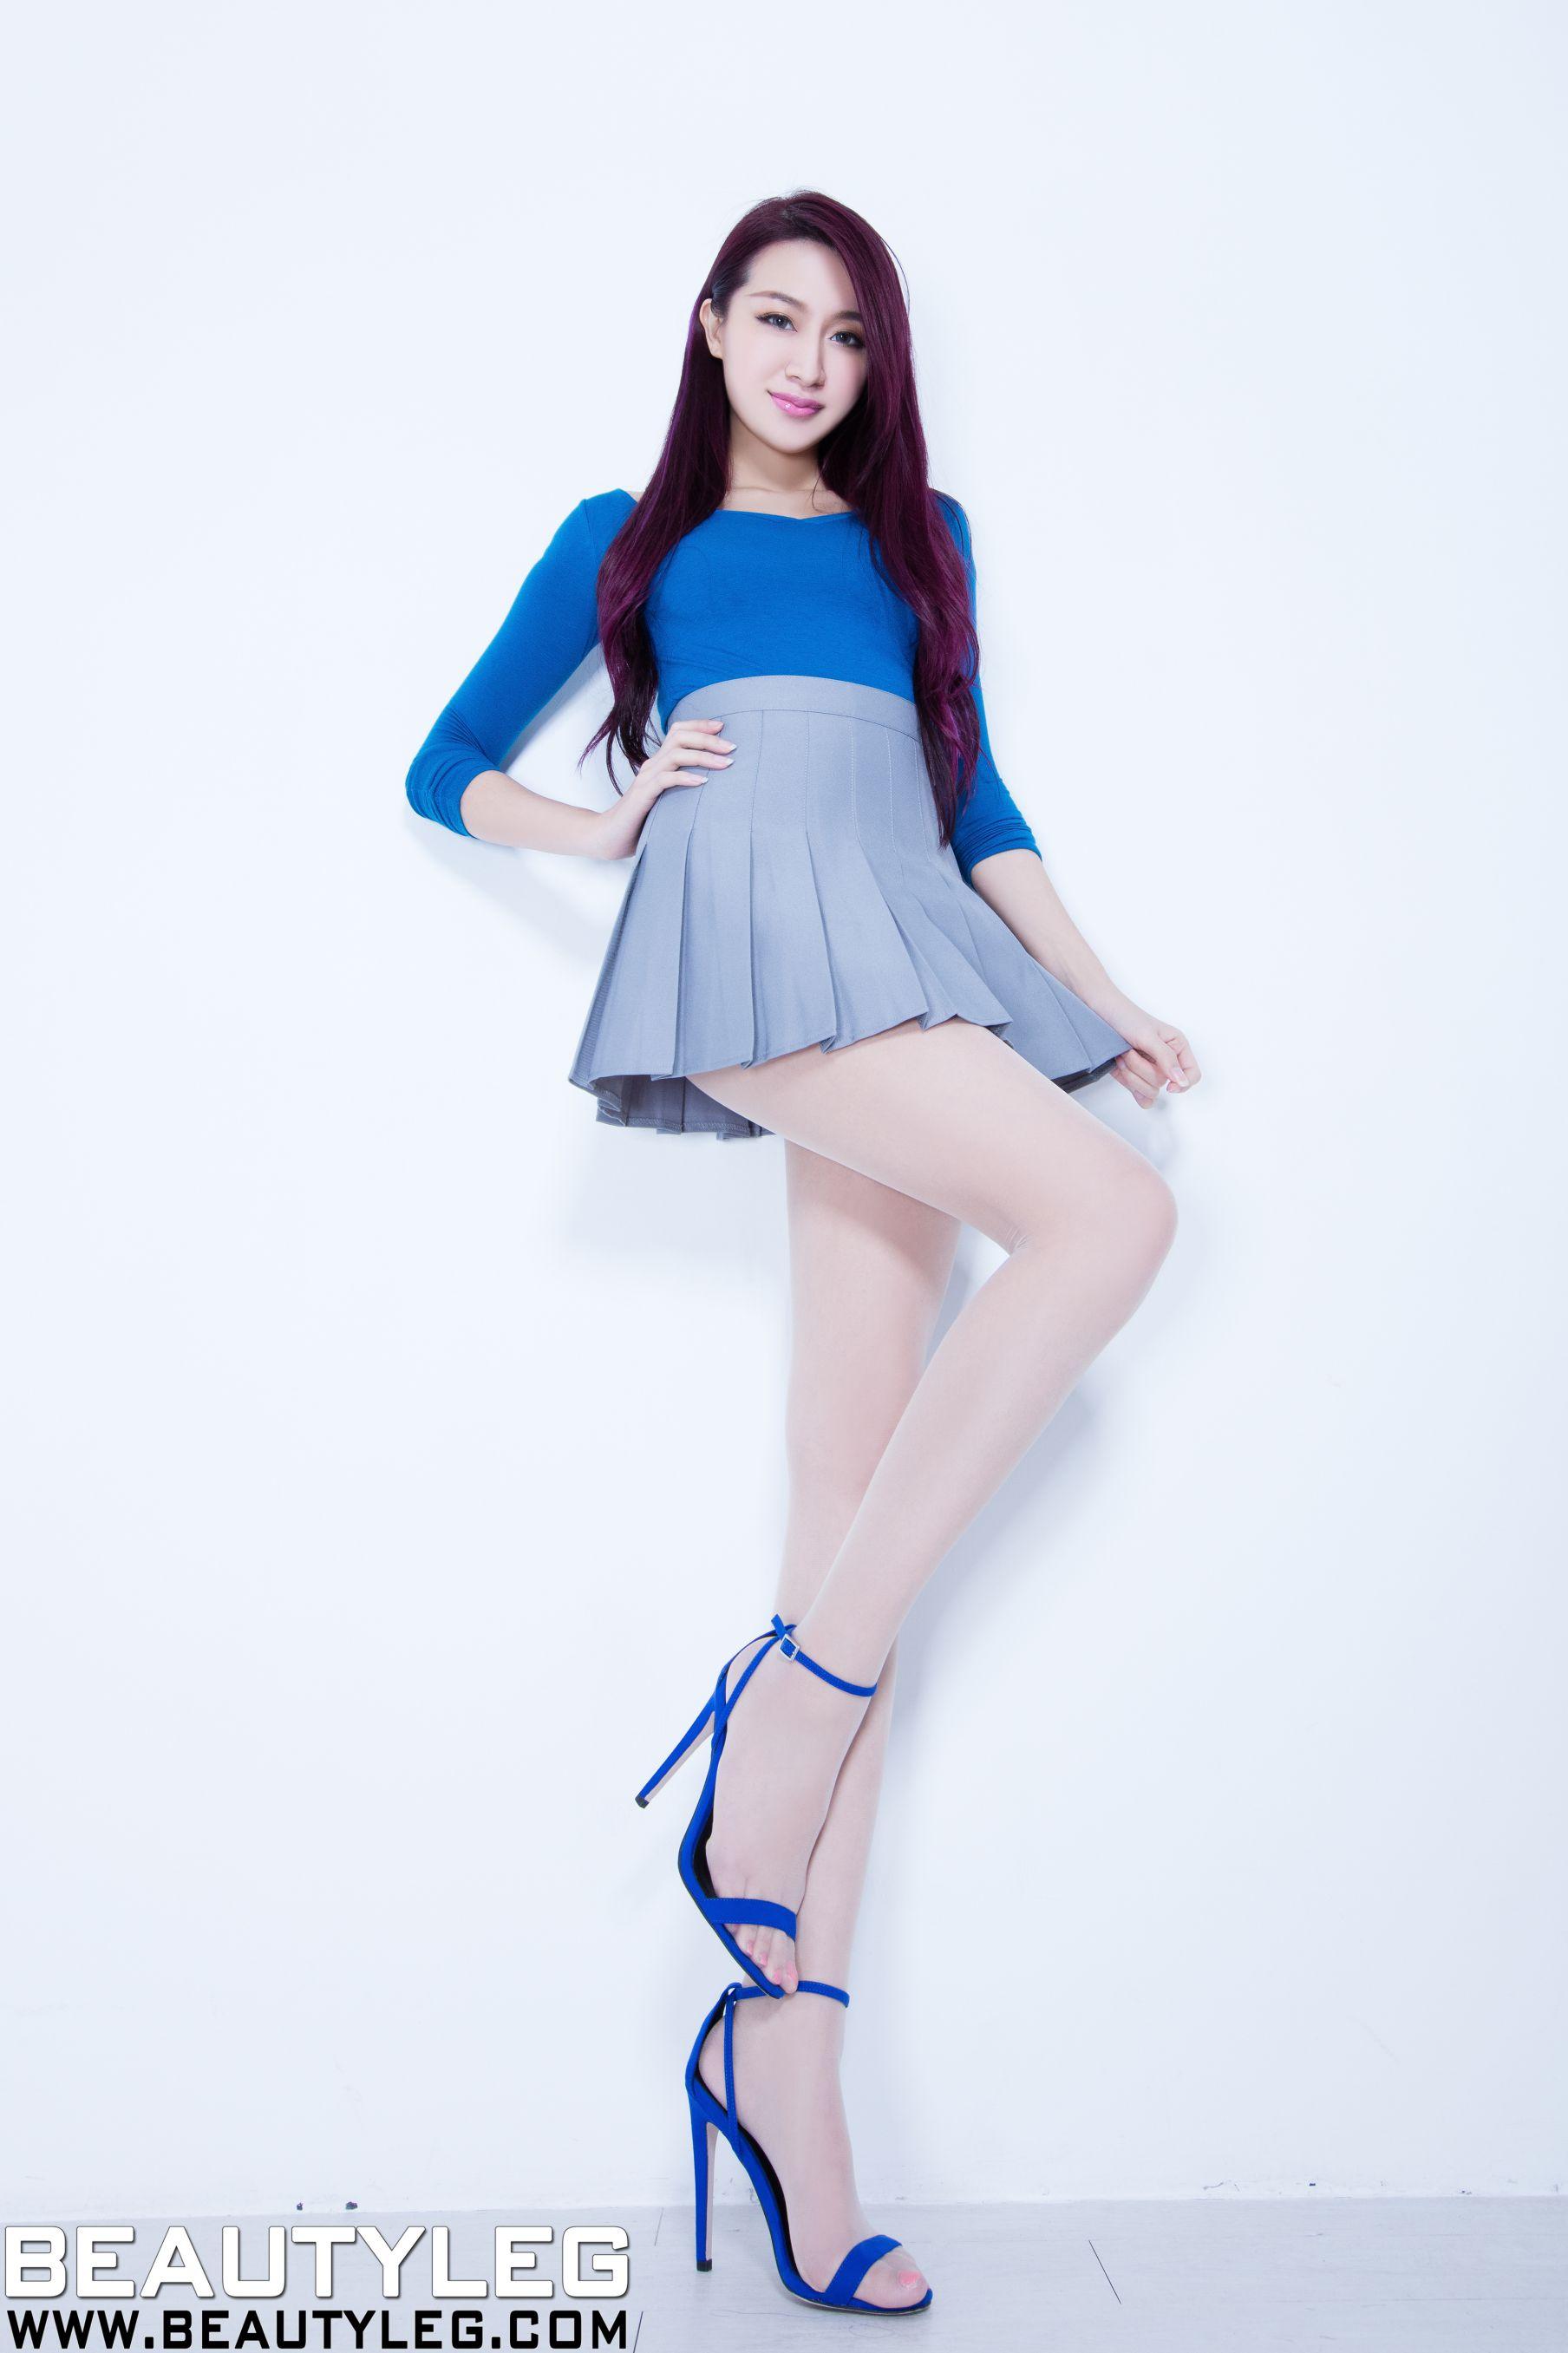 VOL.1616 [Beautyleg]高跟美腿:周宜凌(腿模Dana)高品质写真套图(45P)